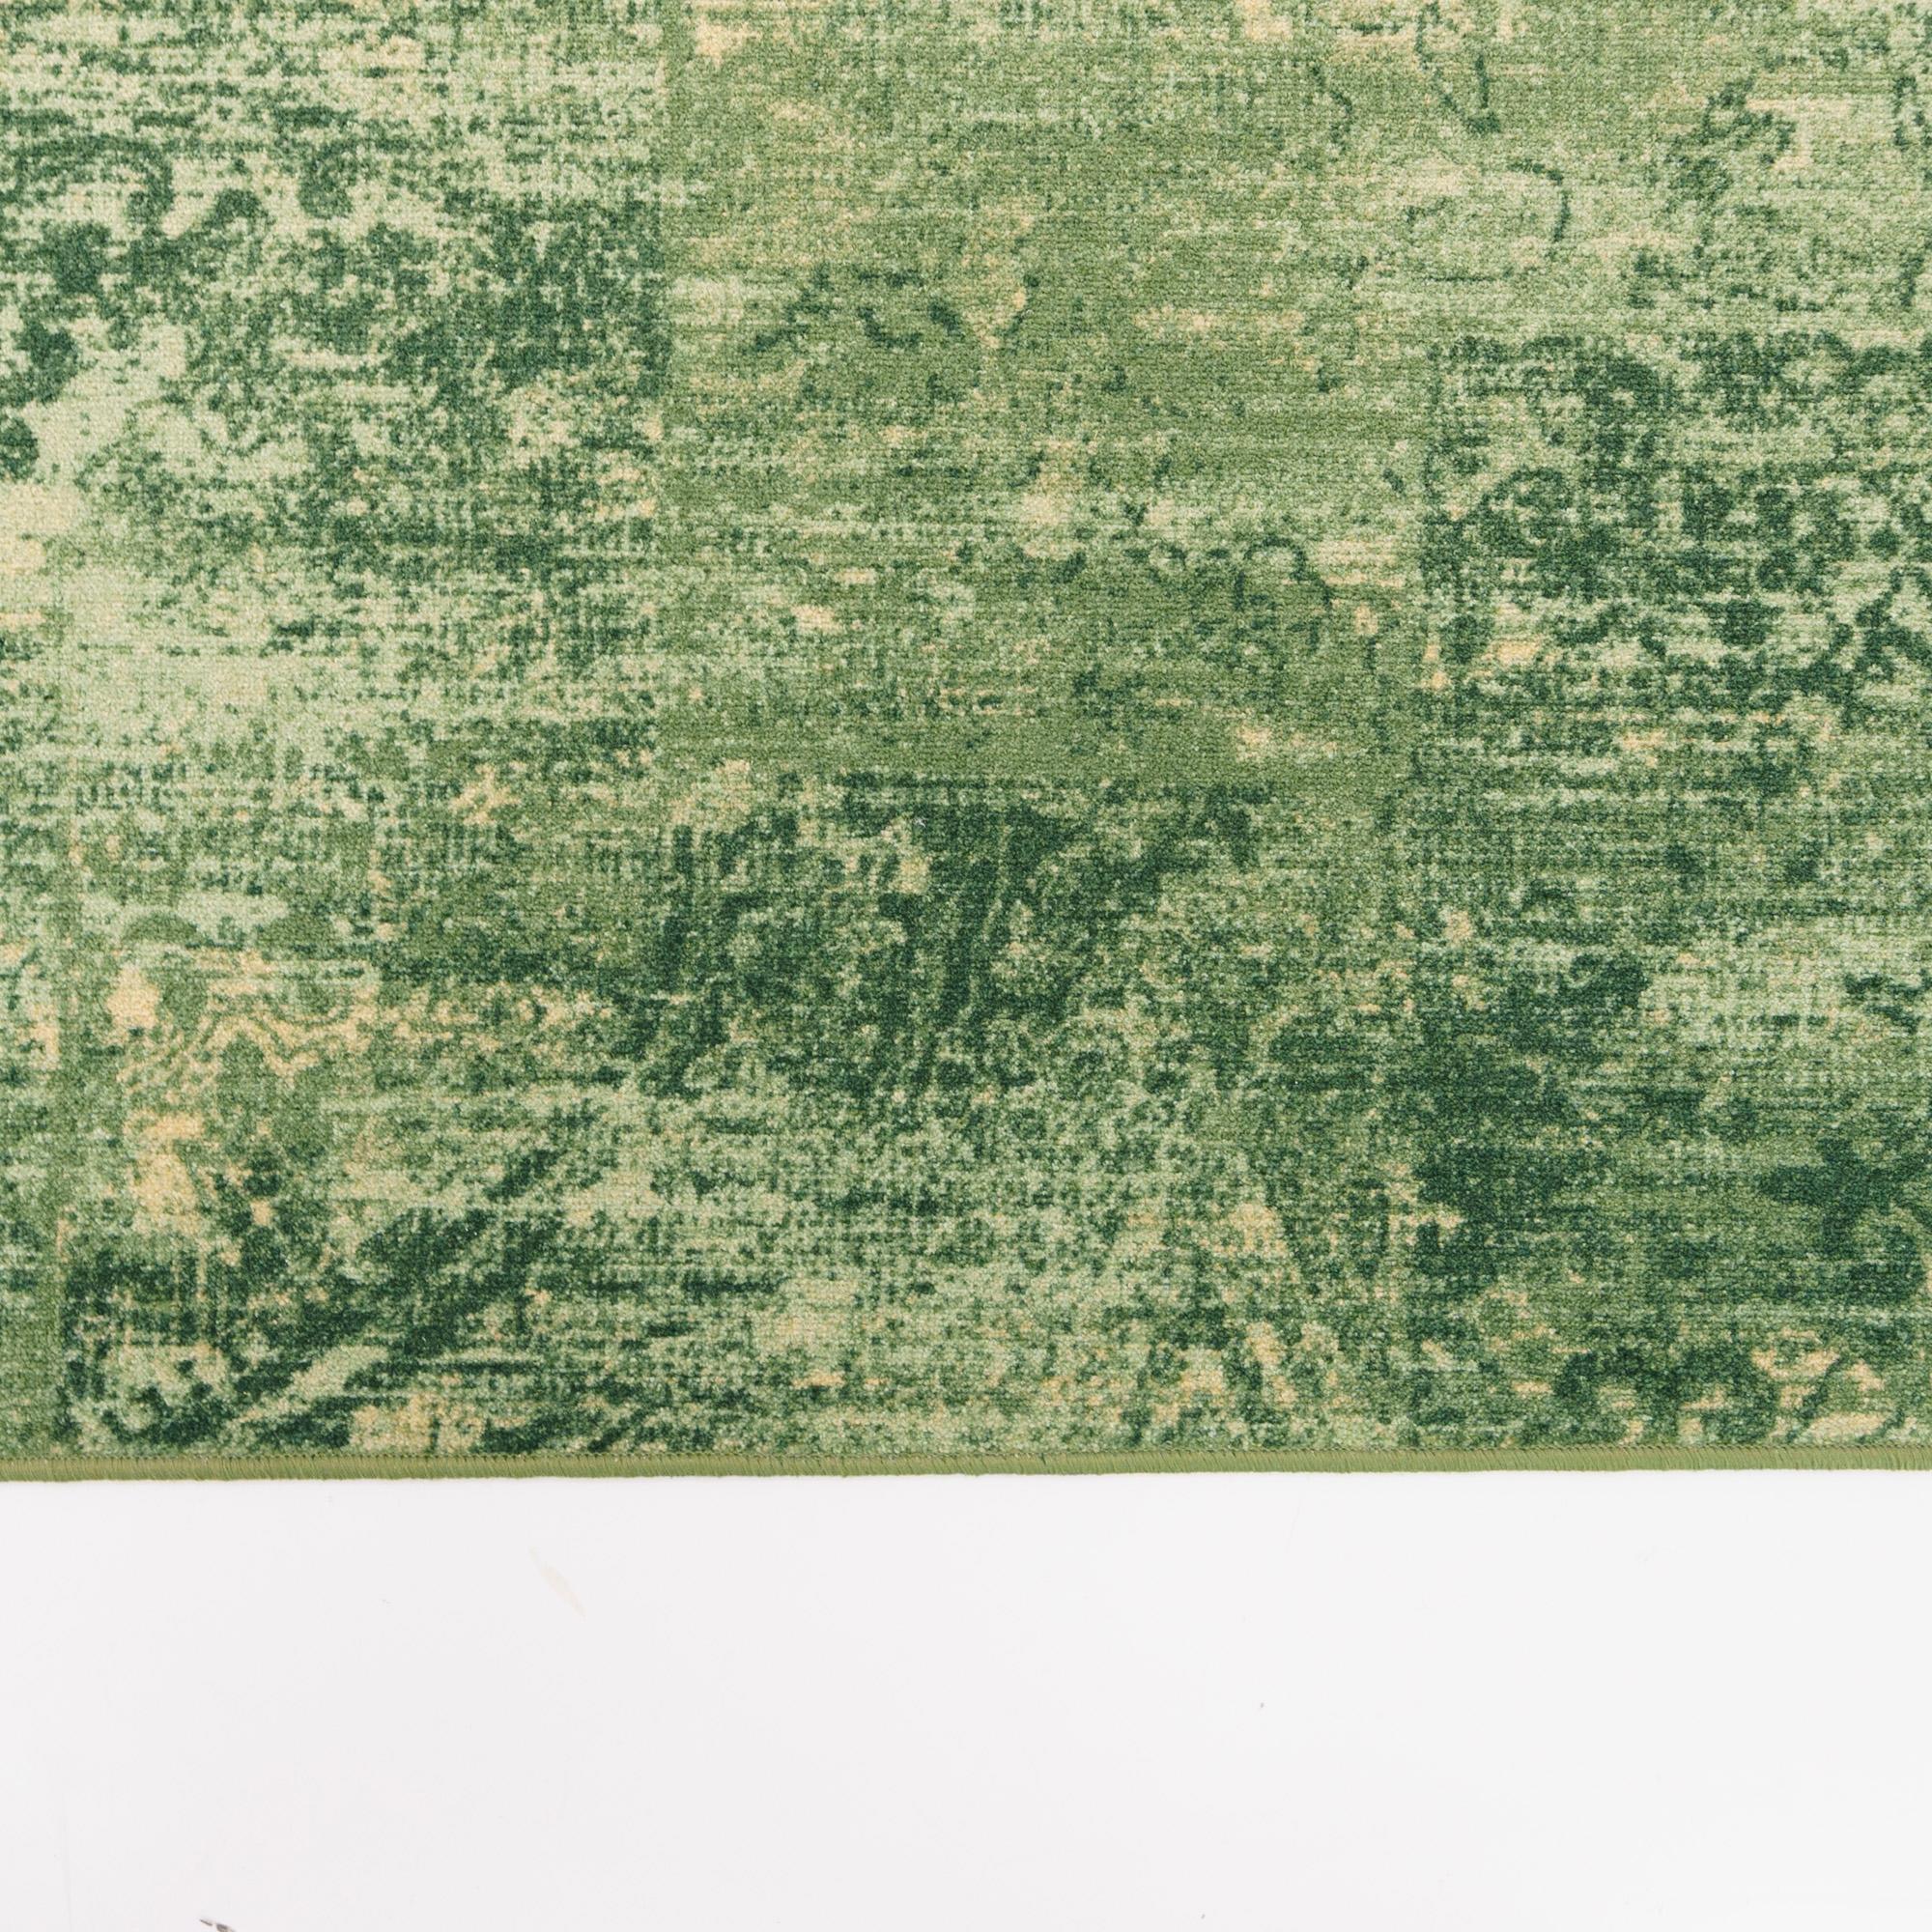 Vintage Vloerkleed Raw Licht Groen